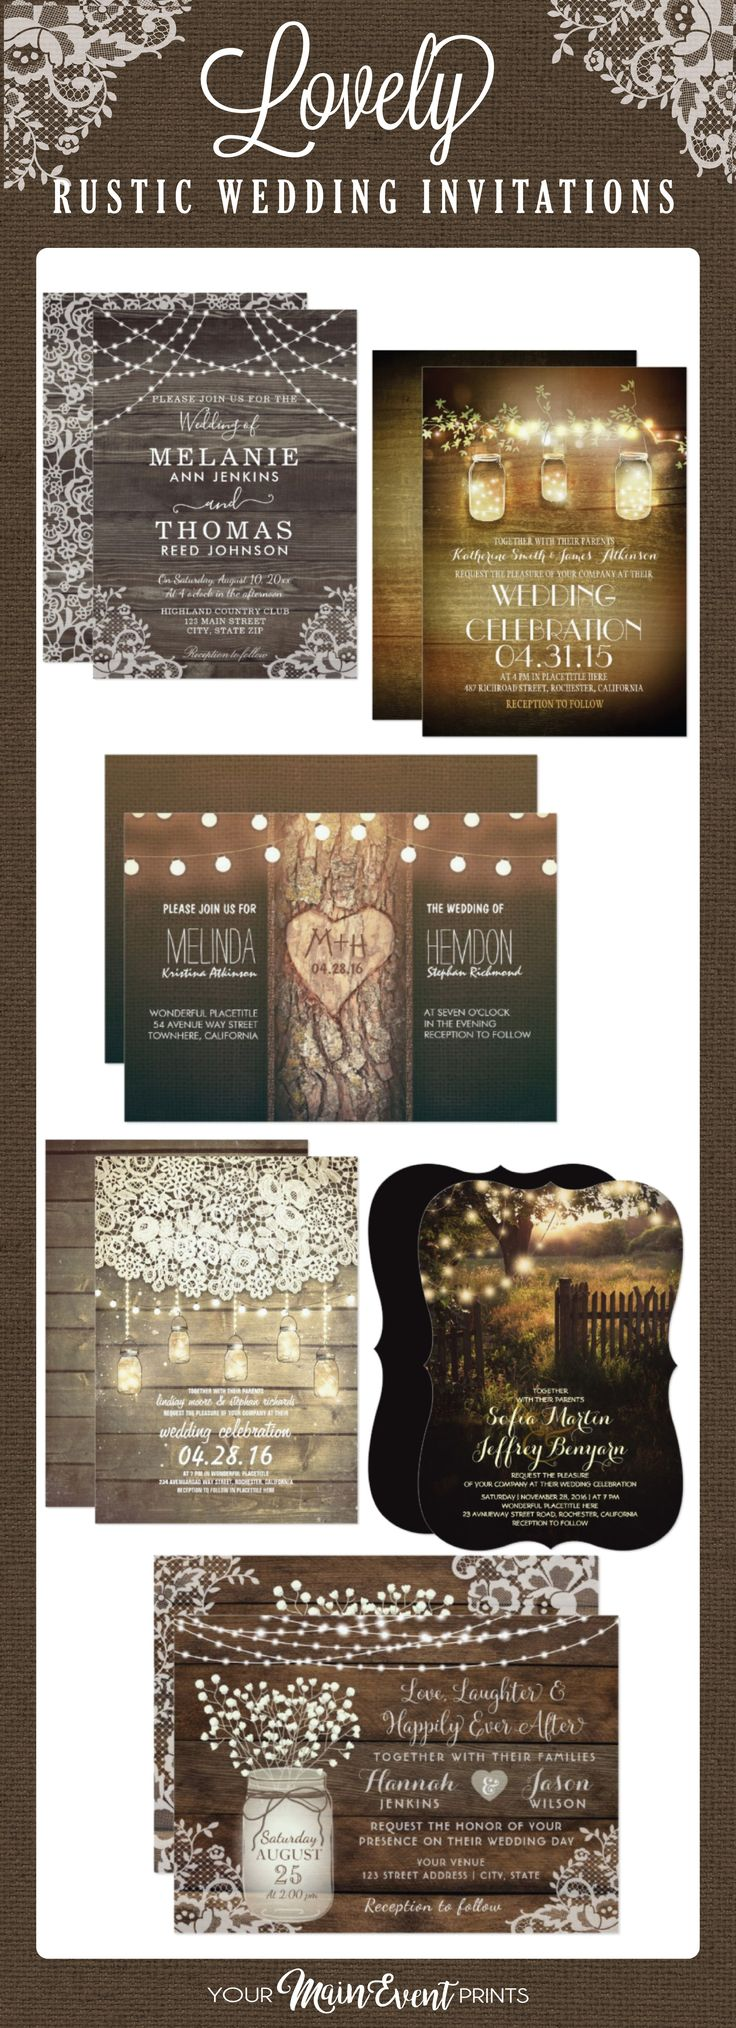 mini book wedding invitations uk%0A Rustic wedding invitations  vintage burlap  wood  mason jar wedding invites   country chic